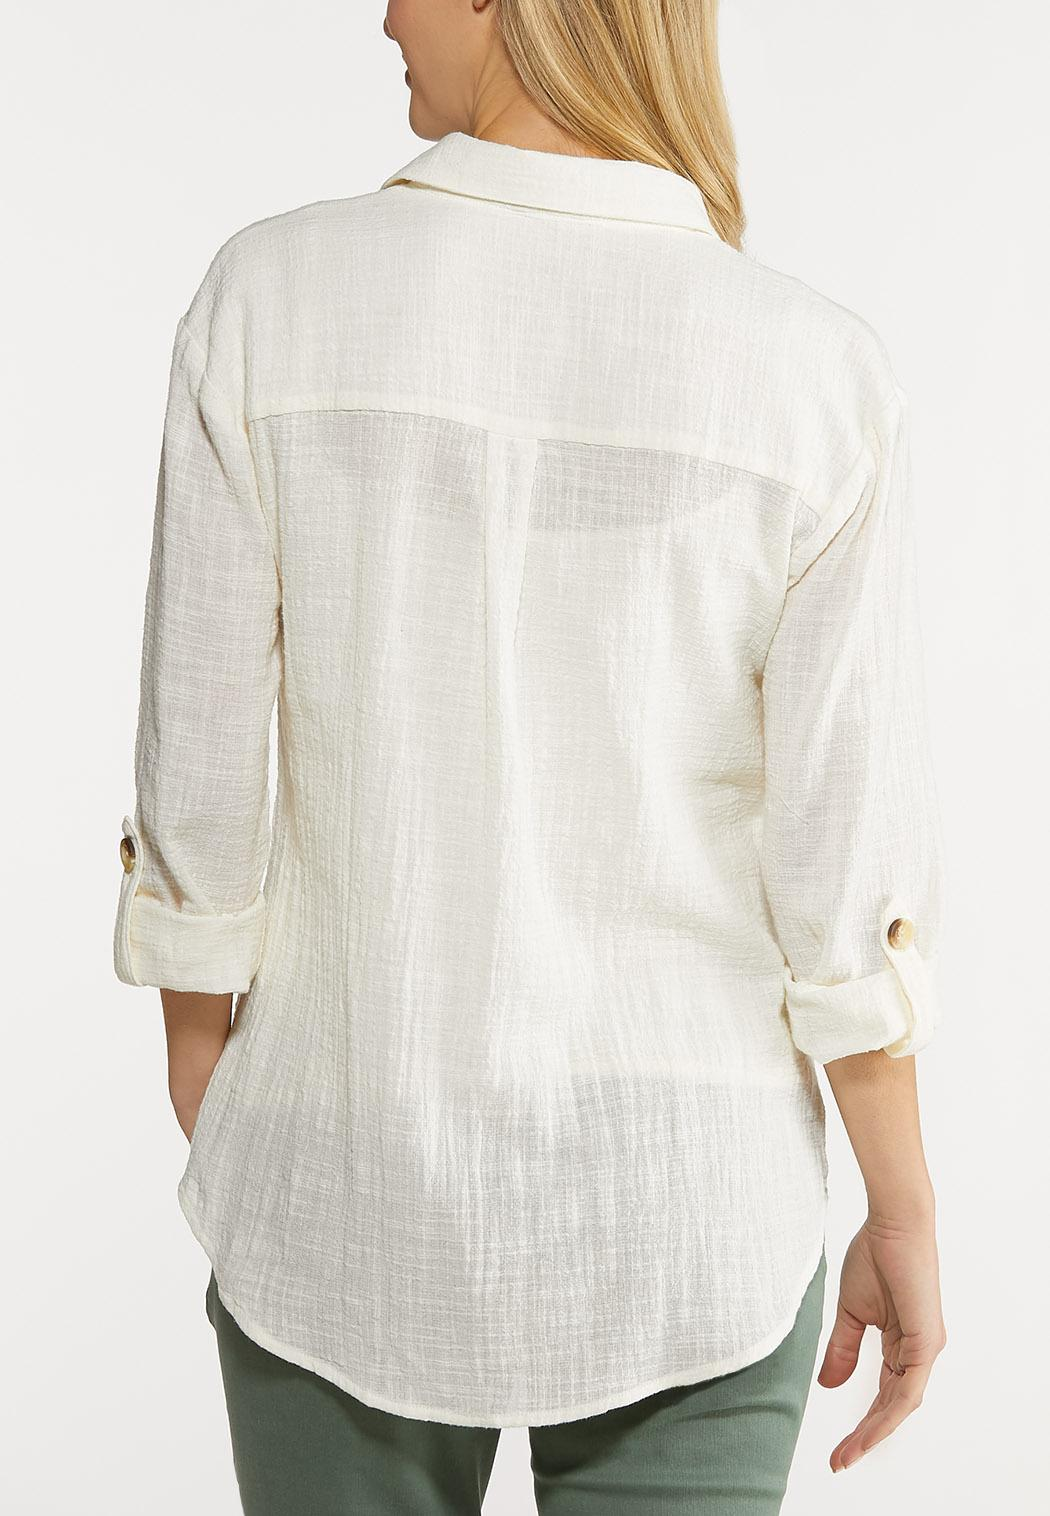 Ivory Linen Top (Item #44093871)